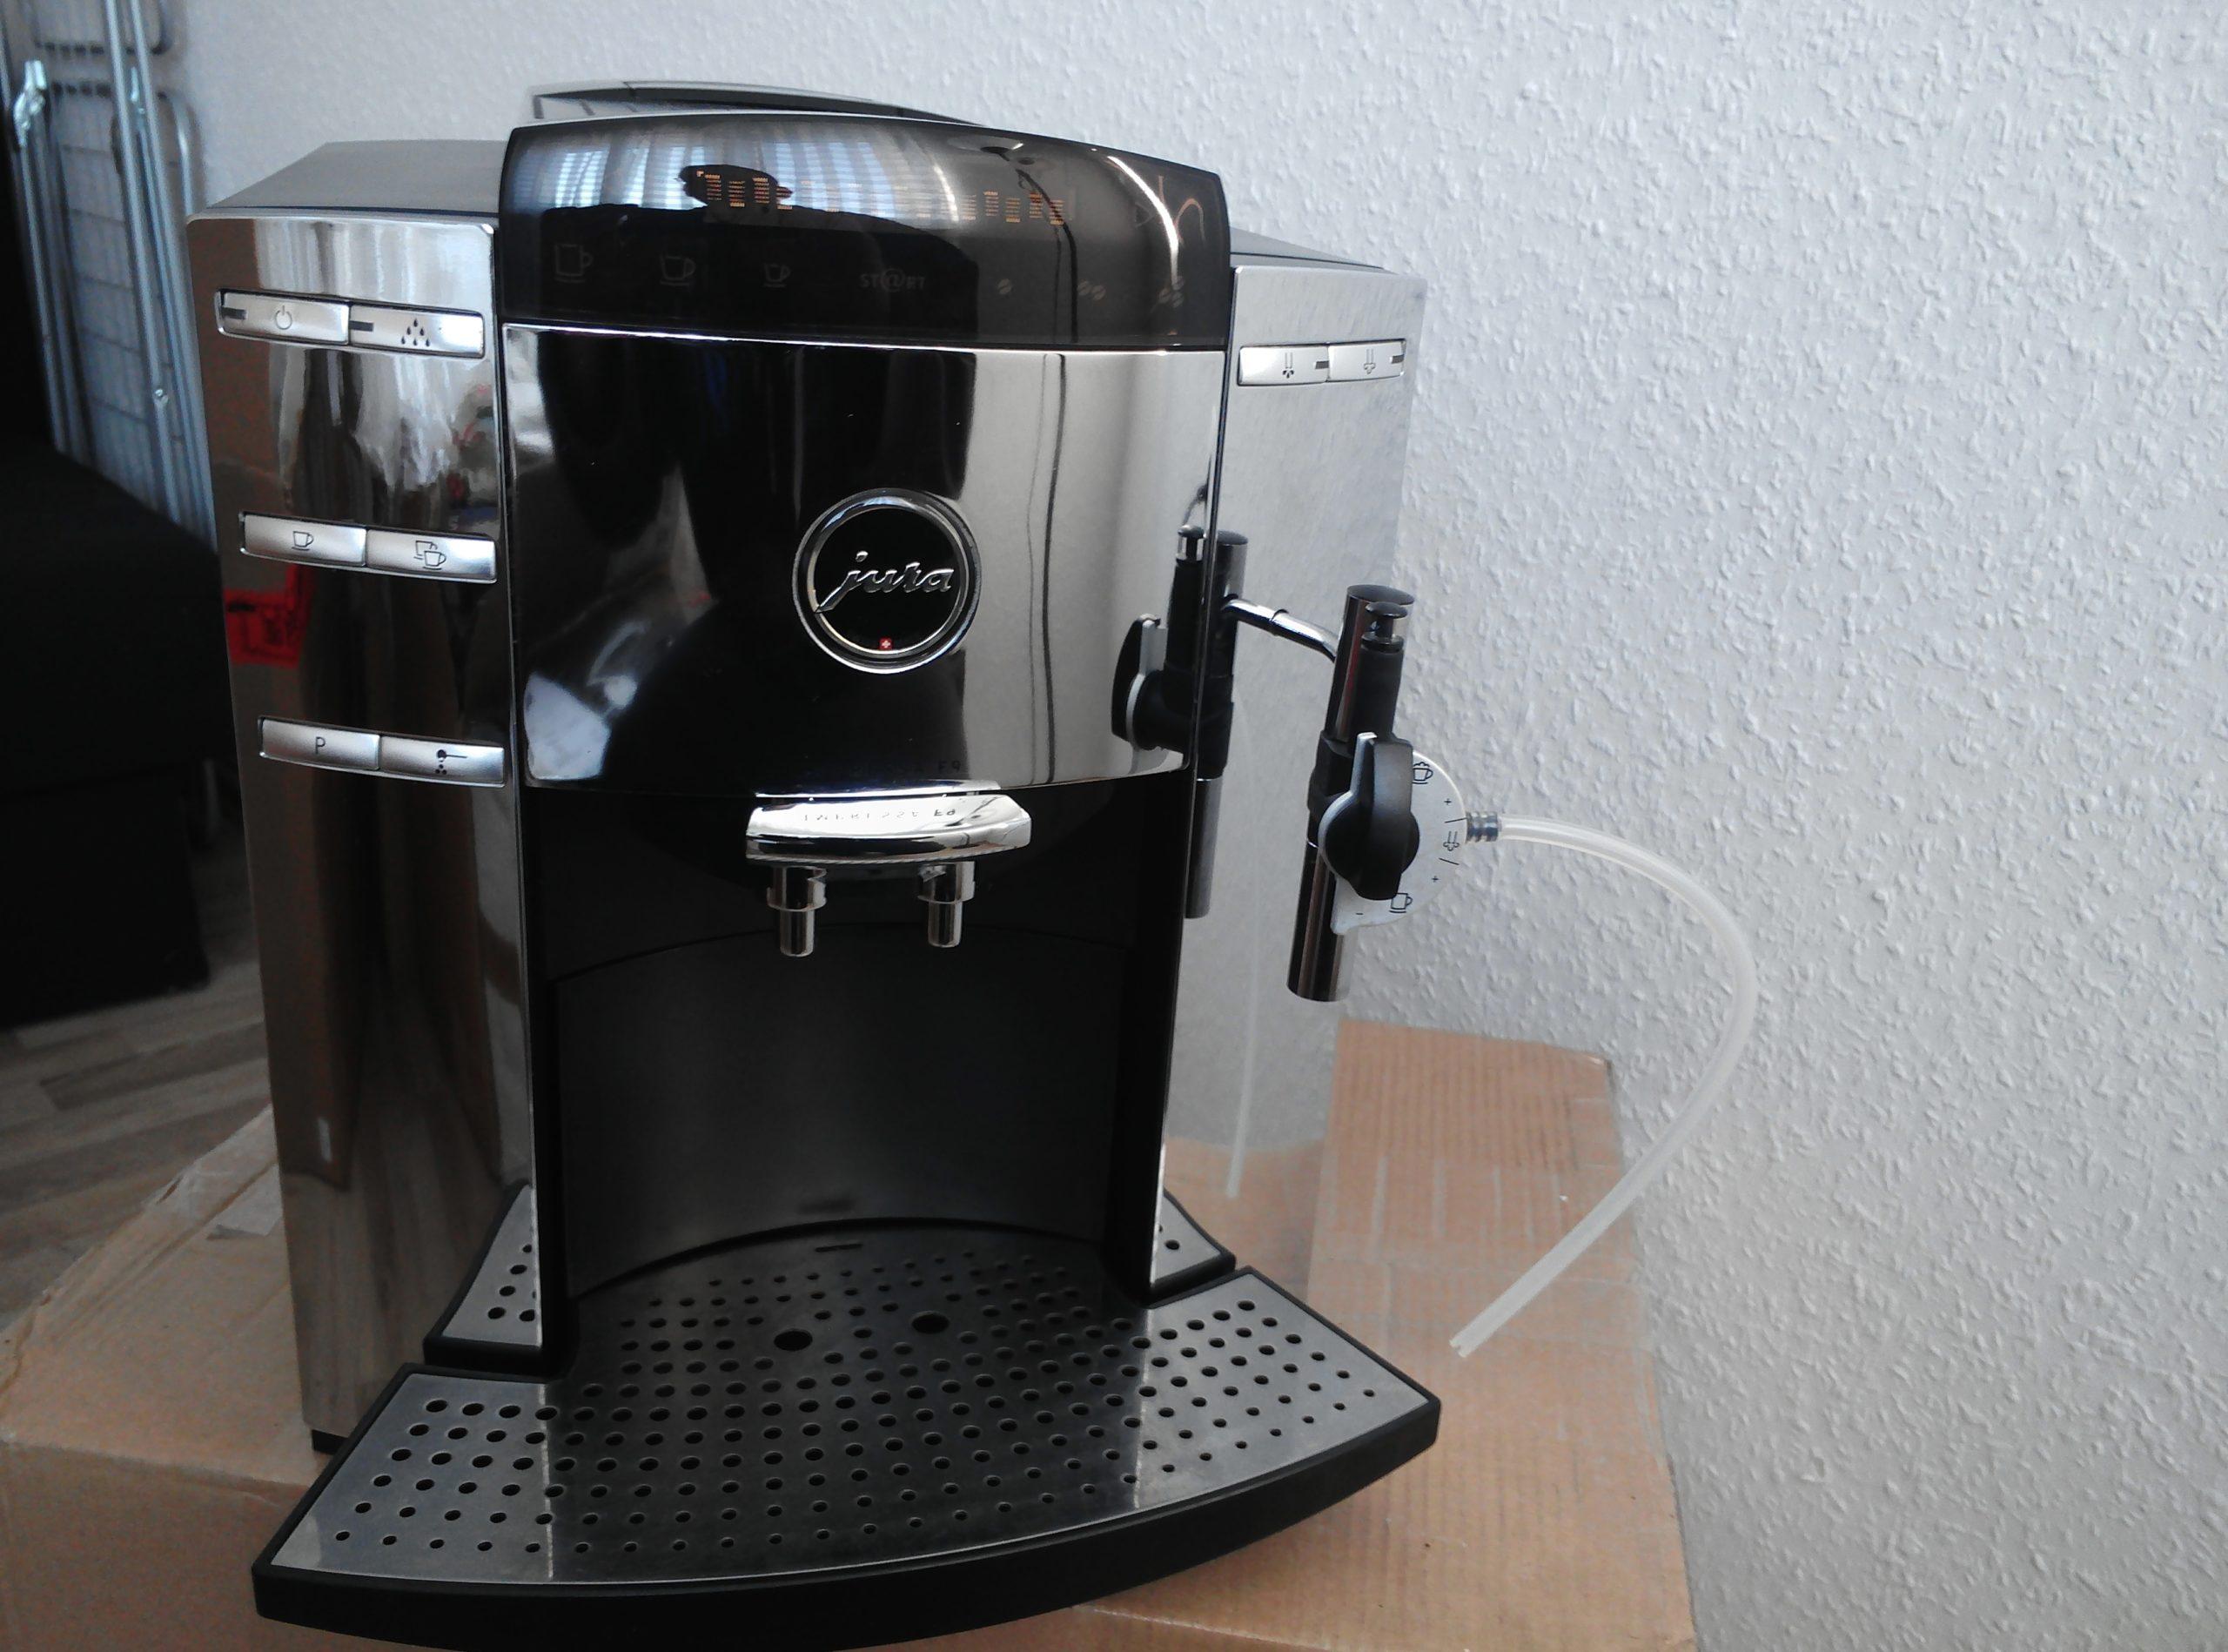 Kaffeevollautomat Jura, Wasser läuft in die Auffangschale.